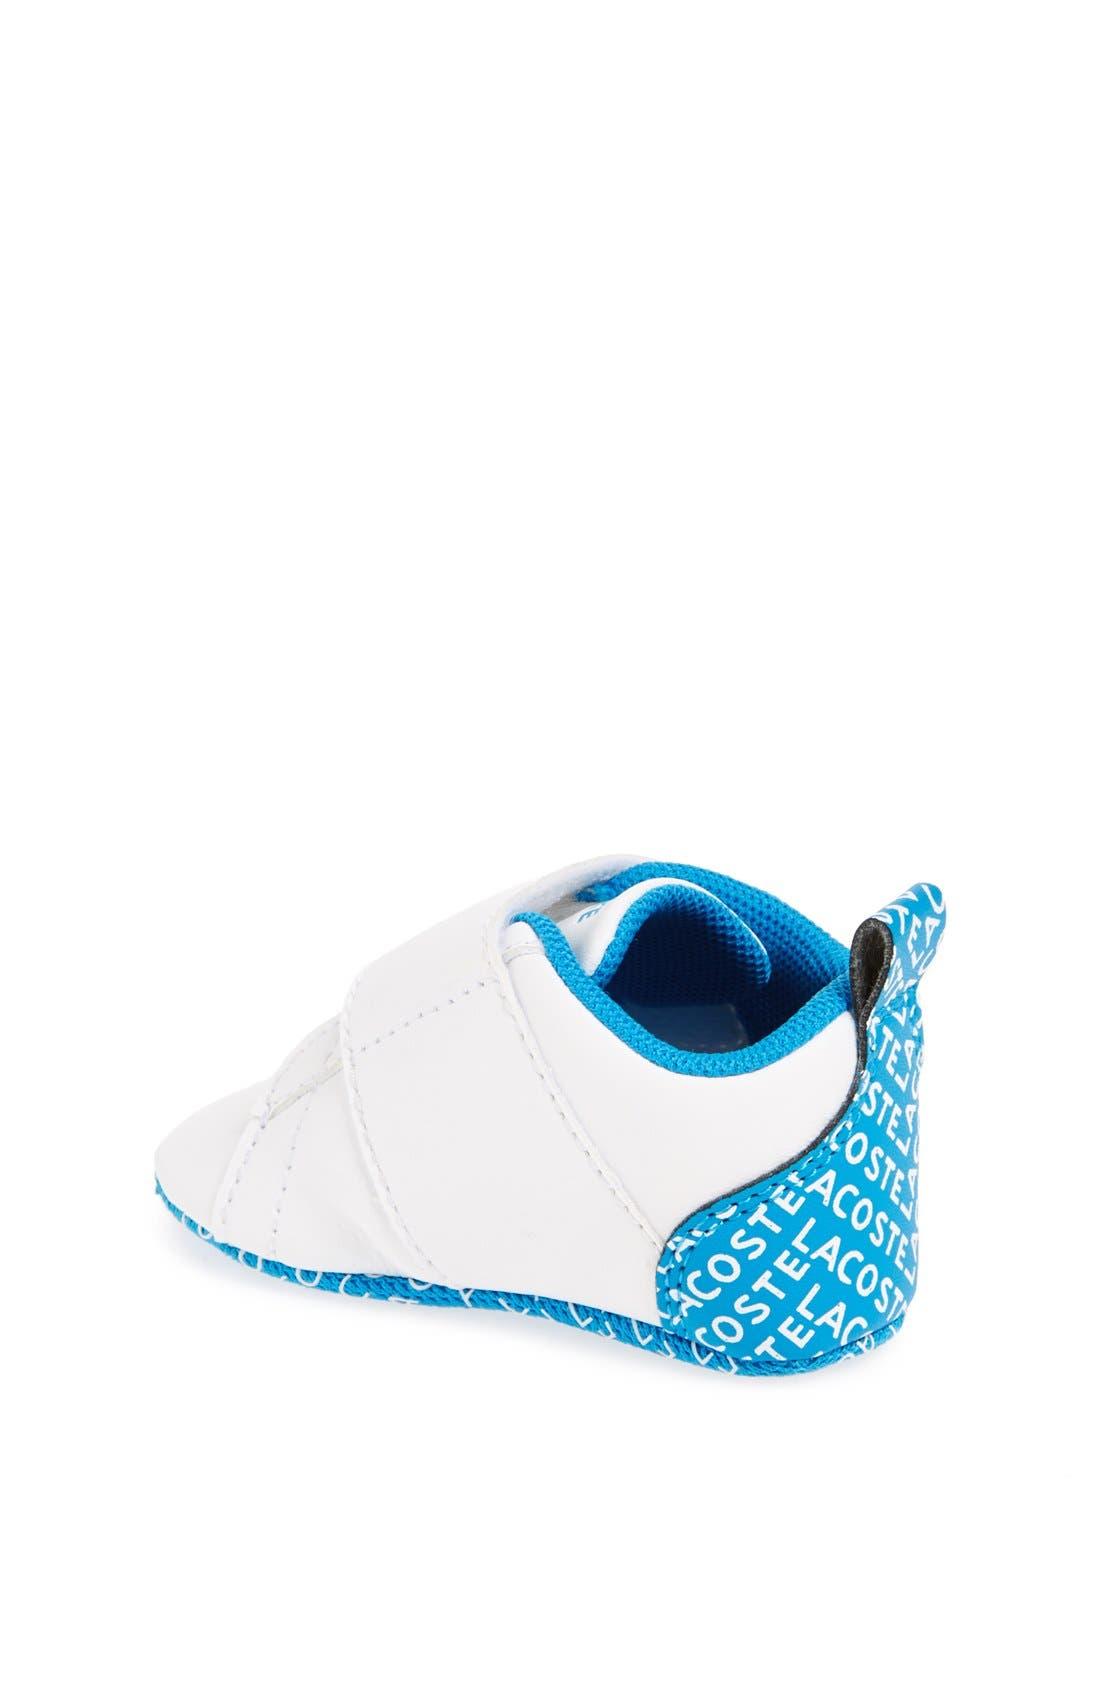 Alternate Image 2  - Lacoste 'Paris Babe' Crib Shoe (Baby)